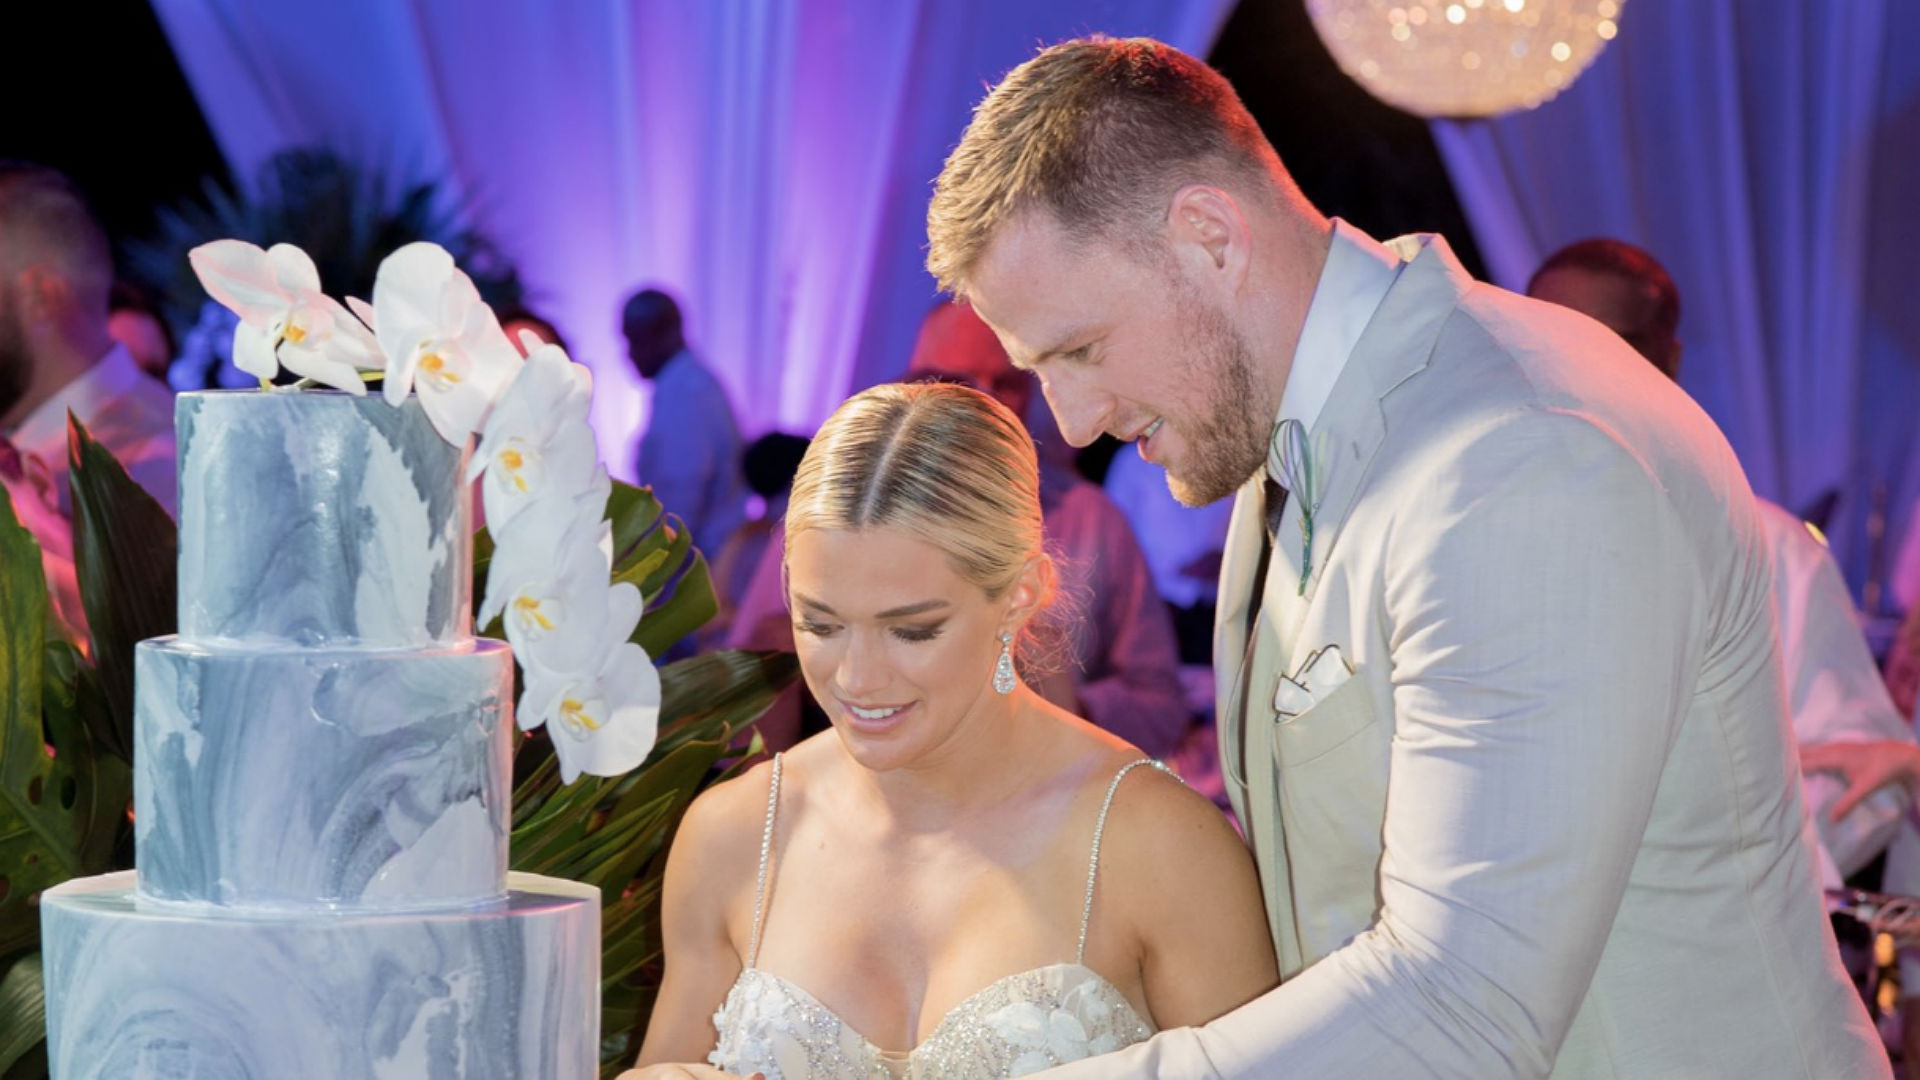 J.J. Watt shares photos from secret wedding in Bahamas